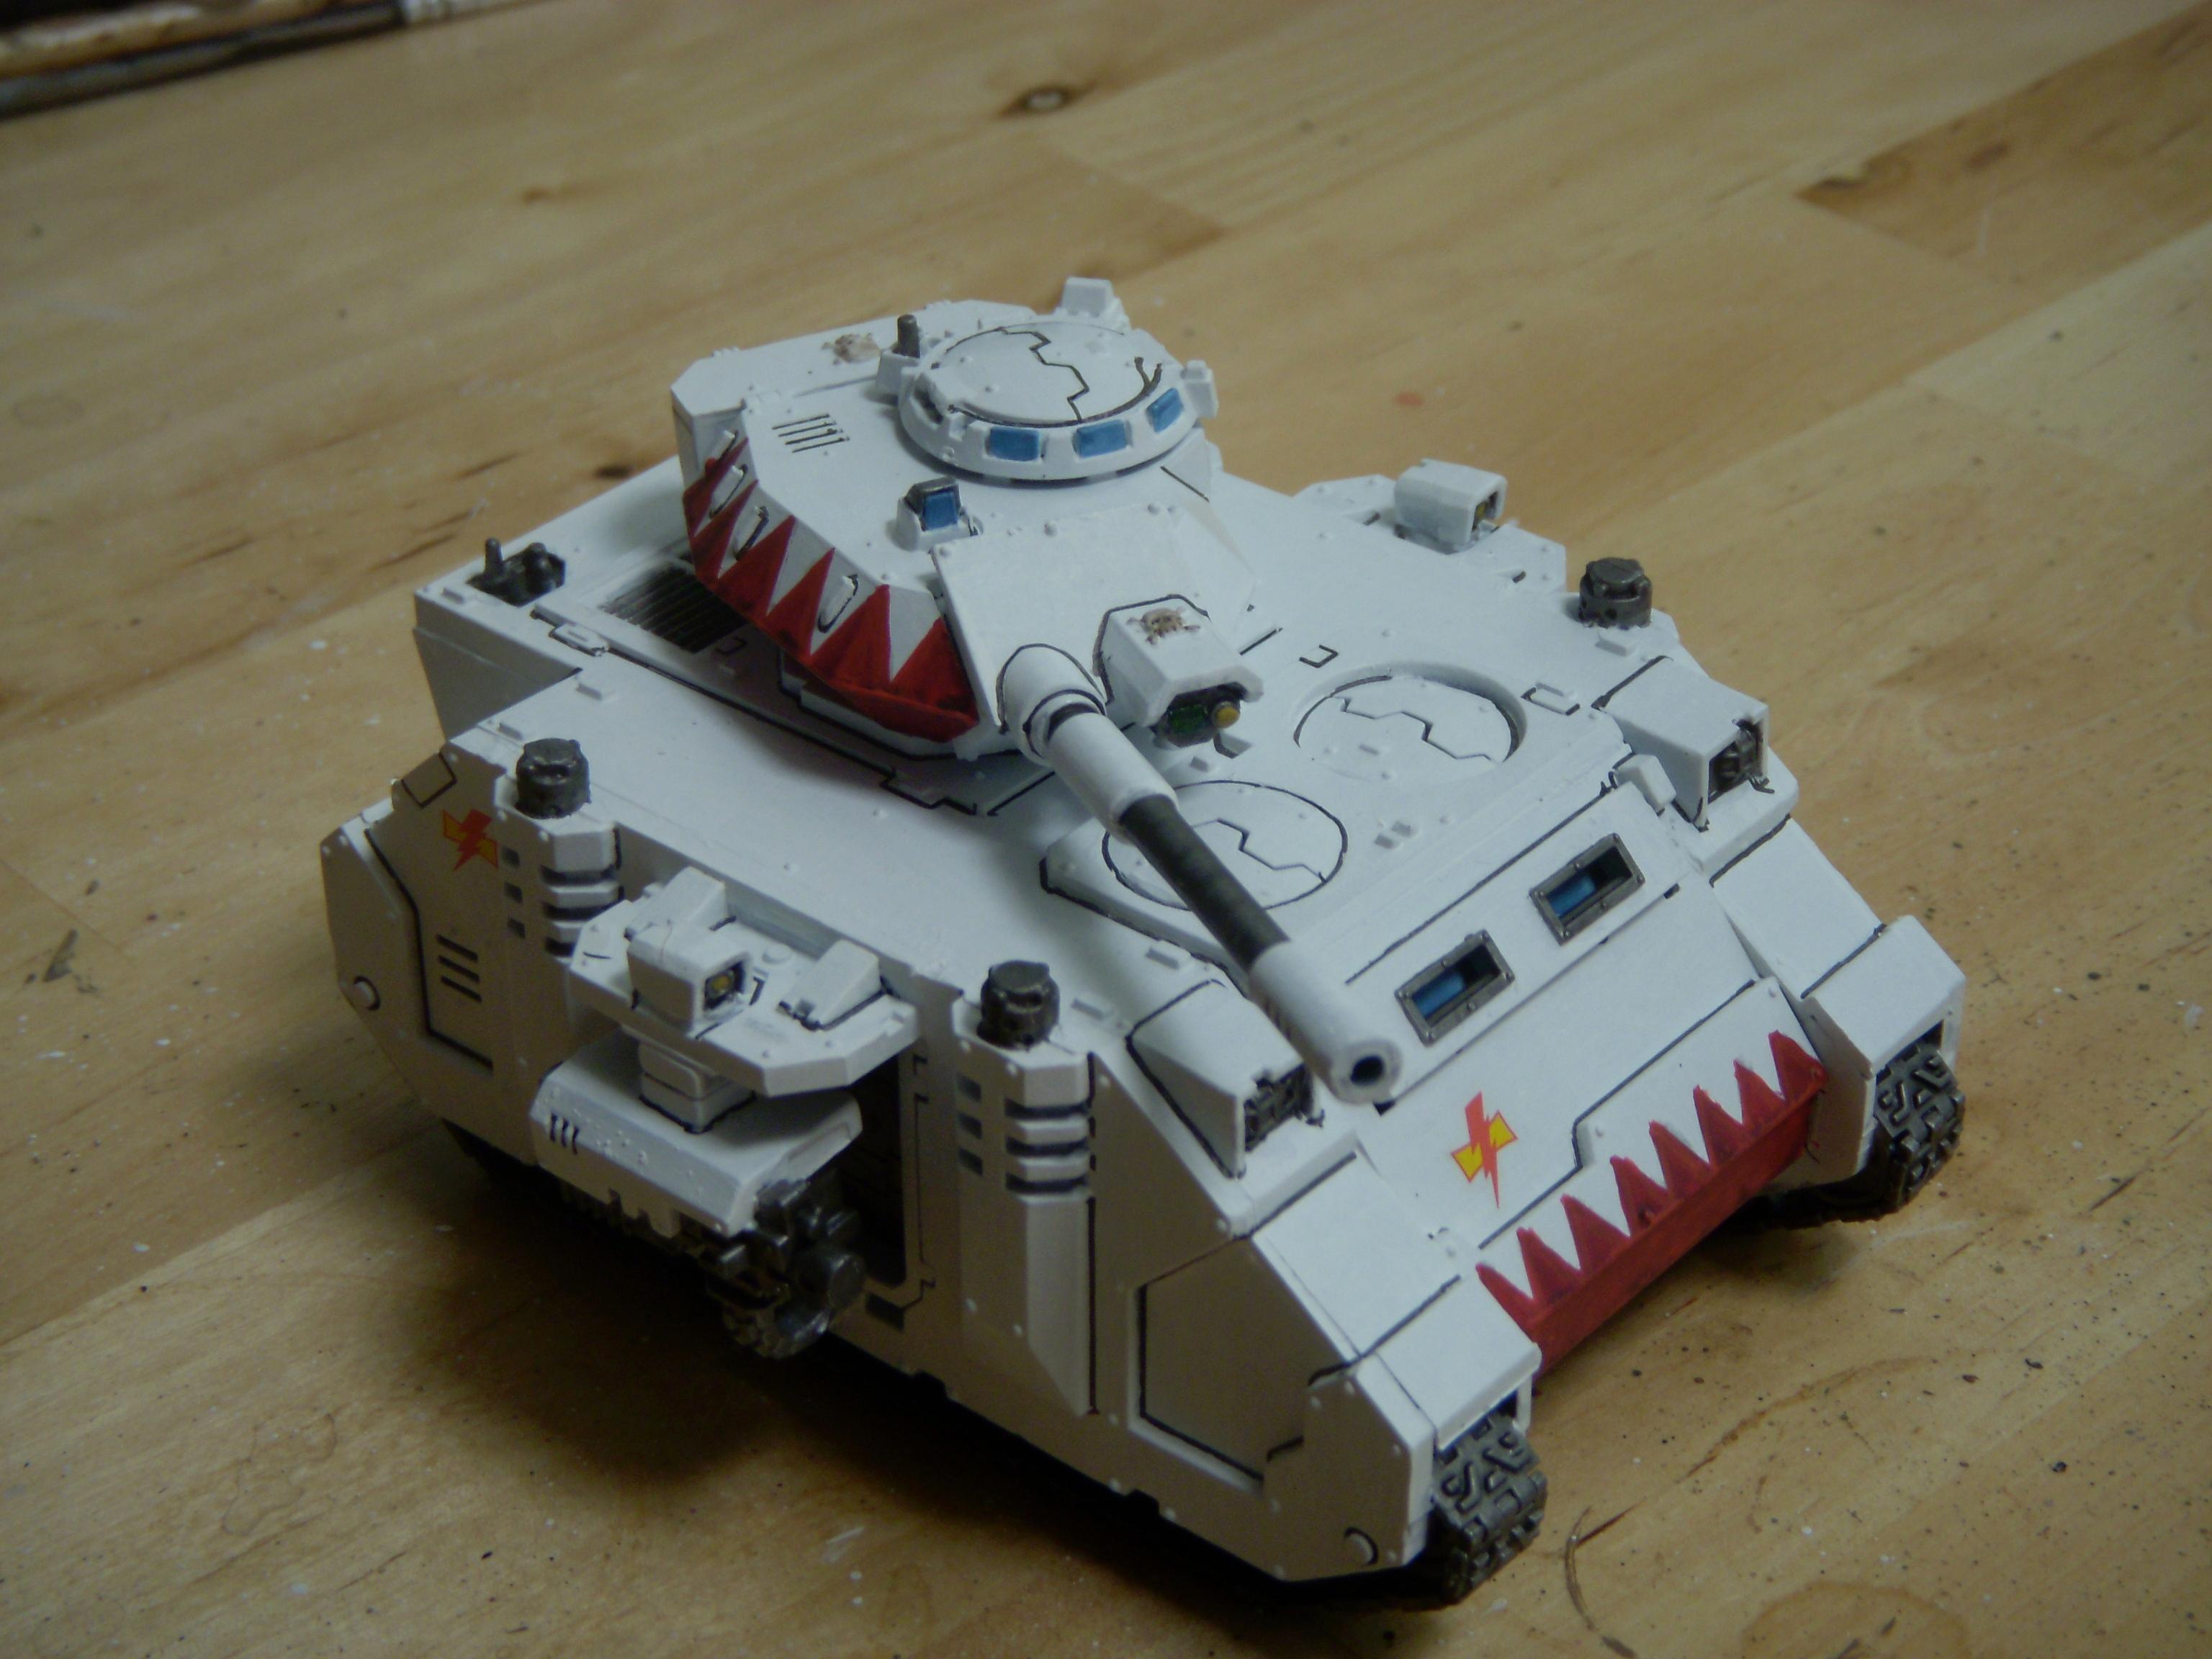 40k Predator, 40kfsu, Clean, Highlight, Space Marine Whitescars, White Scars